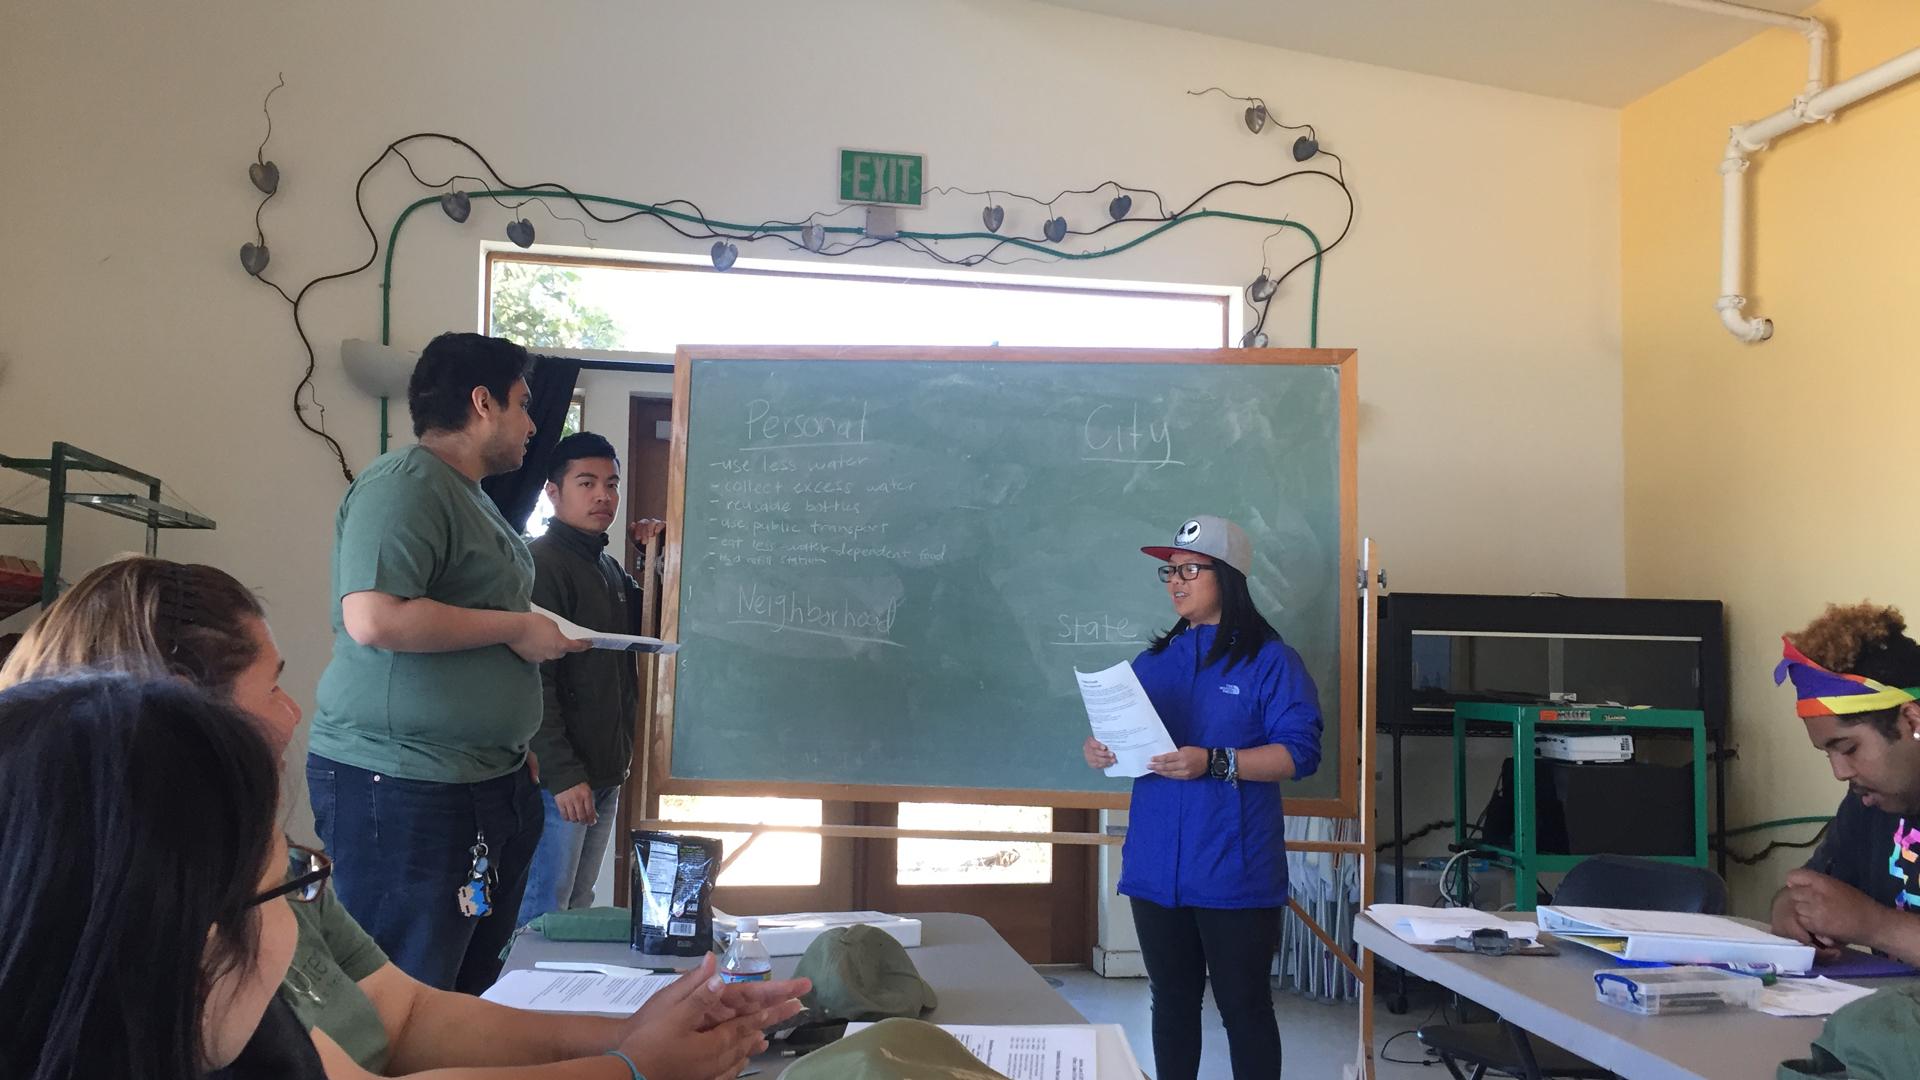 Workshop Four - Public Speaking